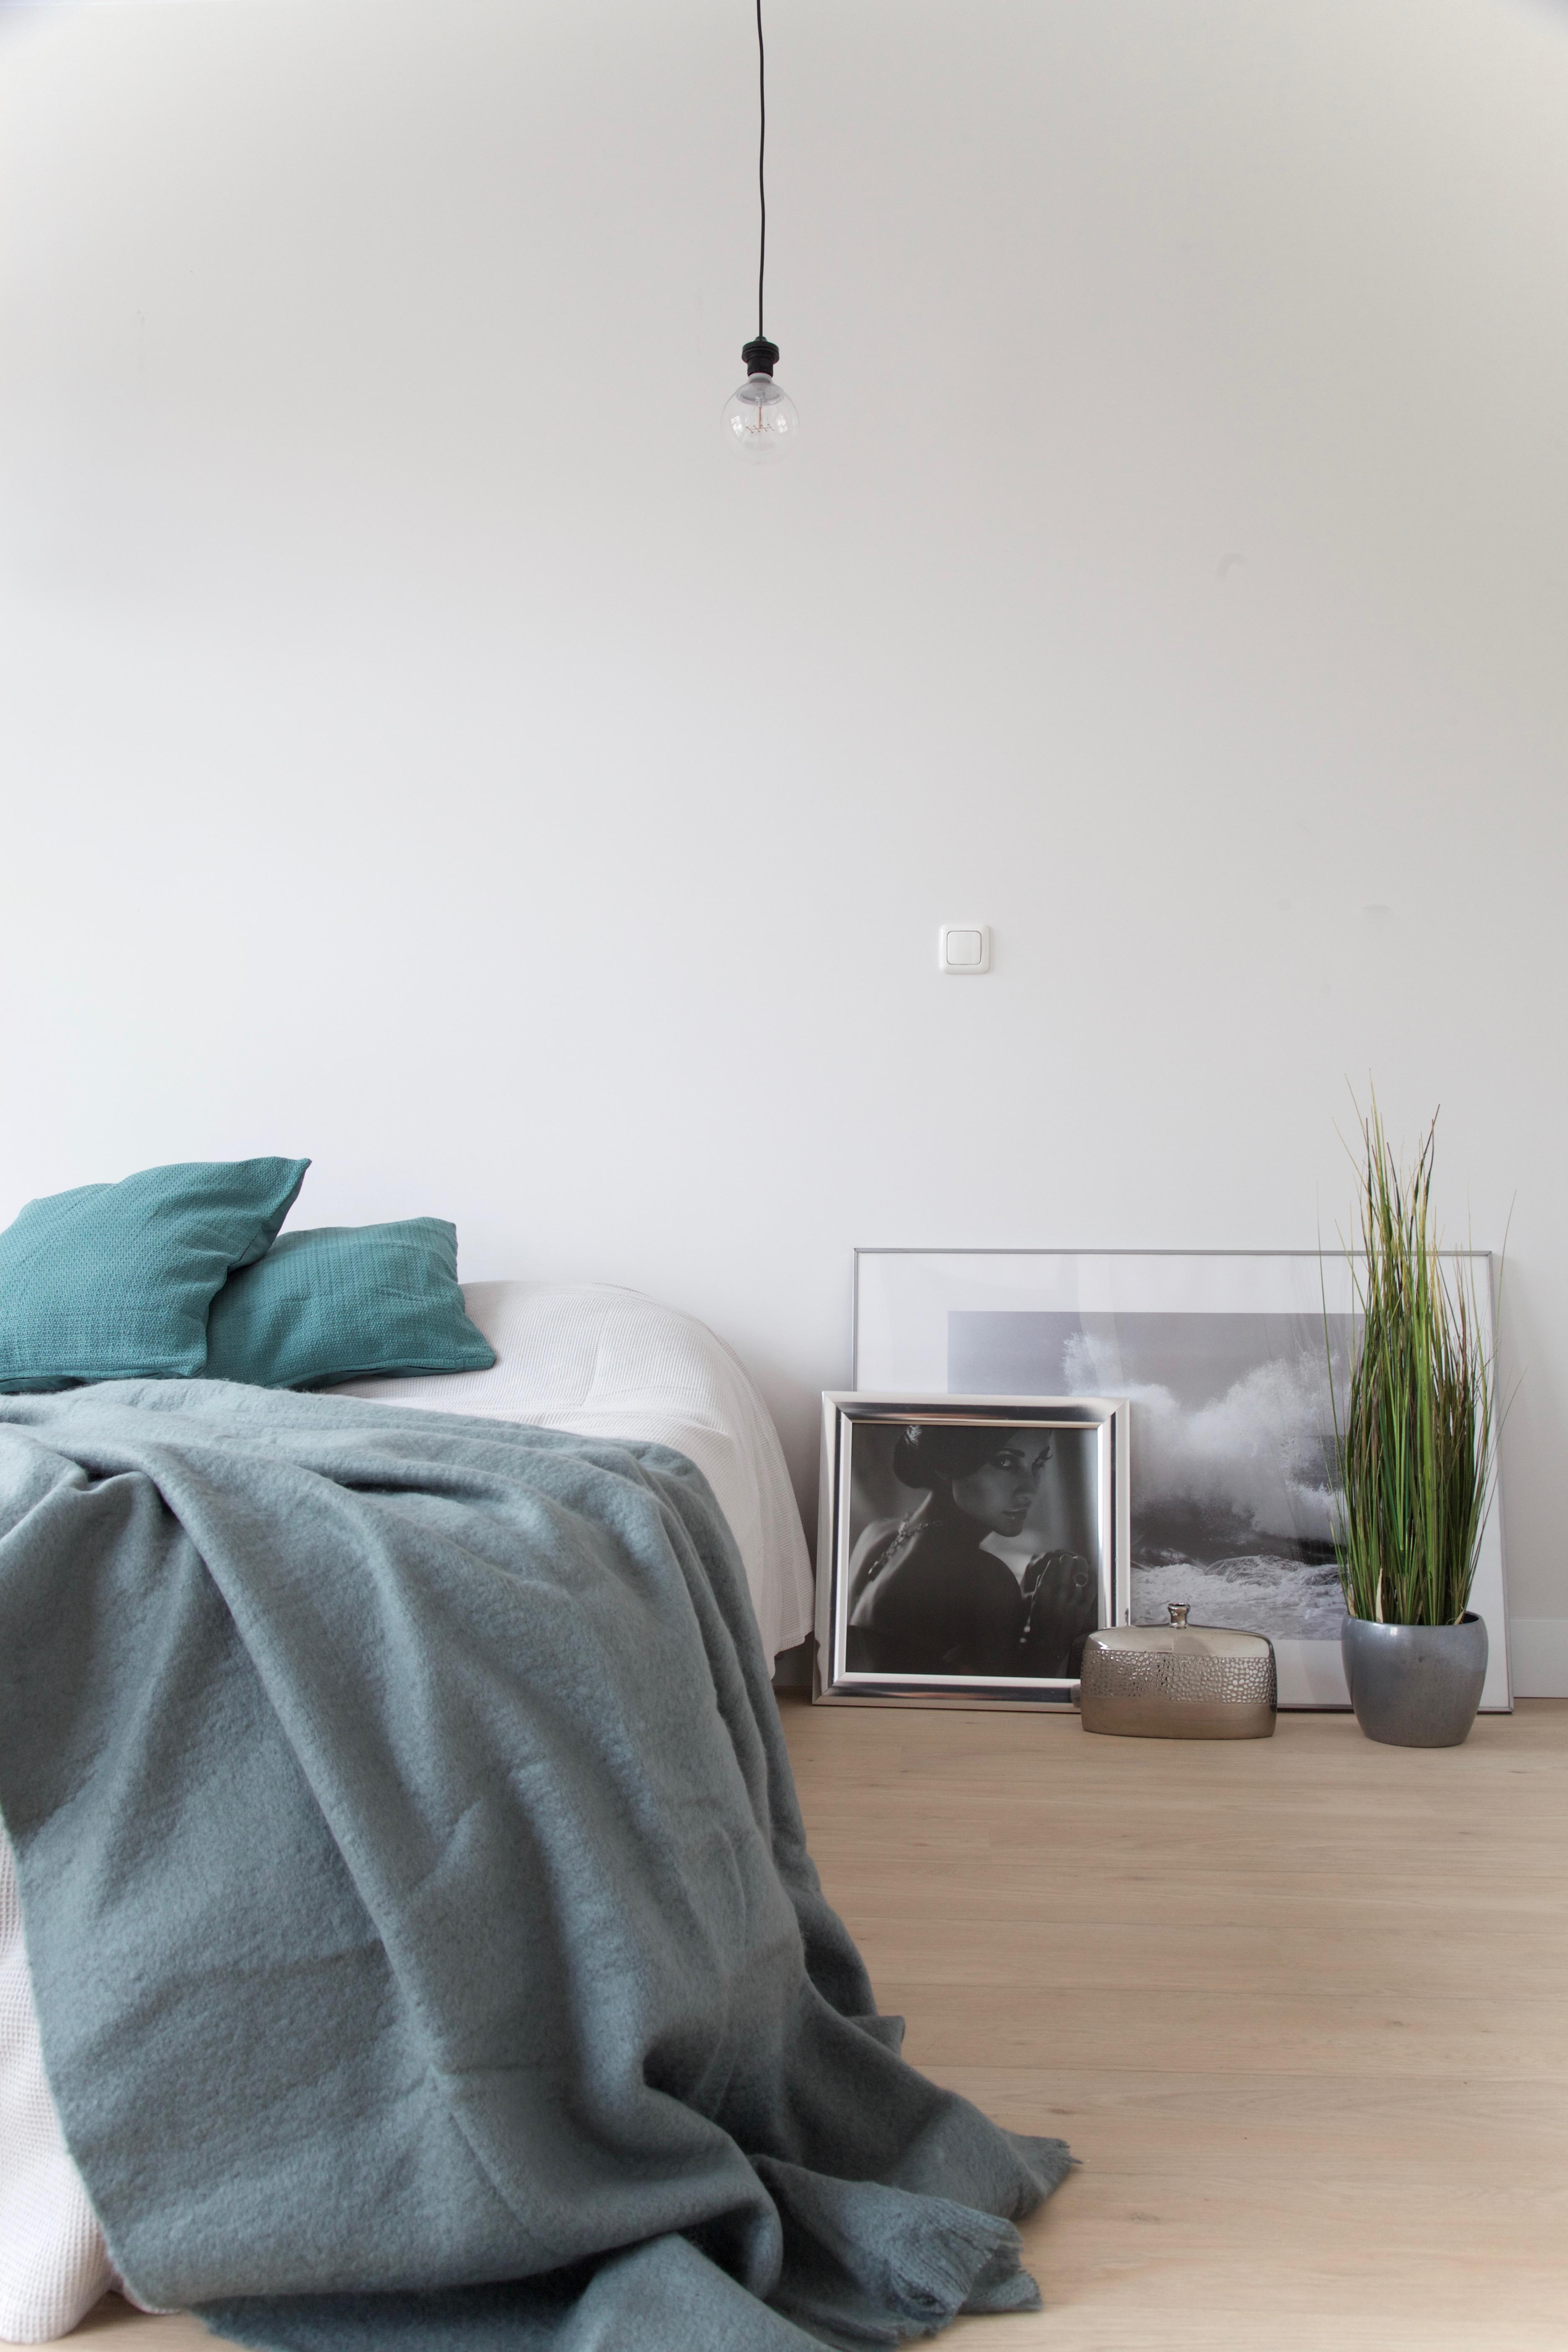 jaimyinterieur verkoopstyling slaapkamer verkoopstyling rotterdam wonen styling interieurstyling interieuradvies vastgoedstyling vastgoed